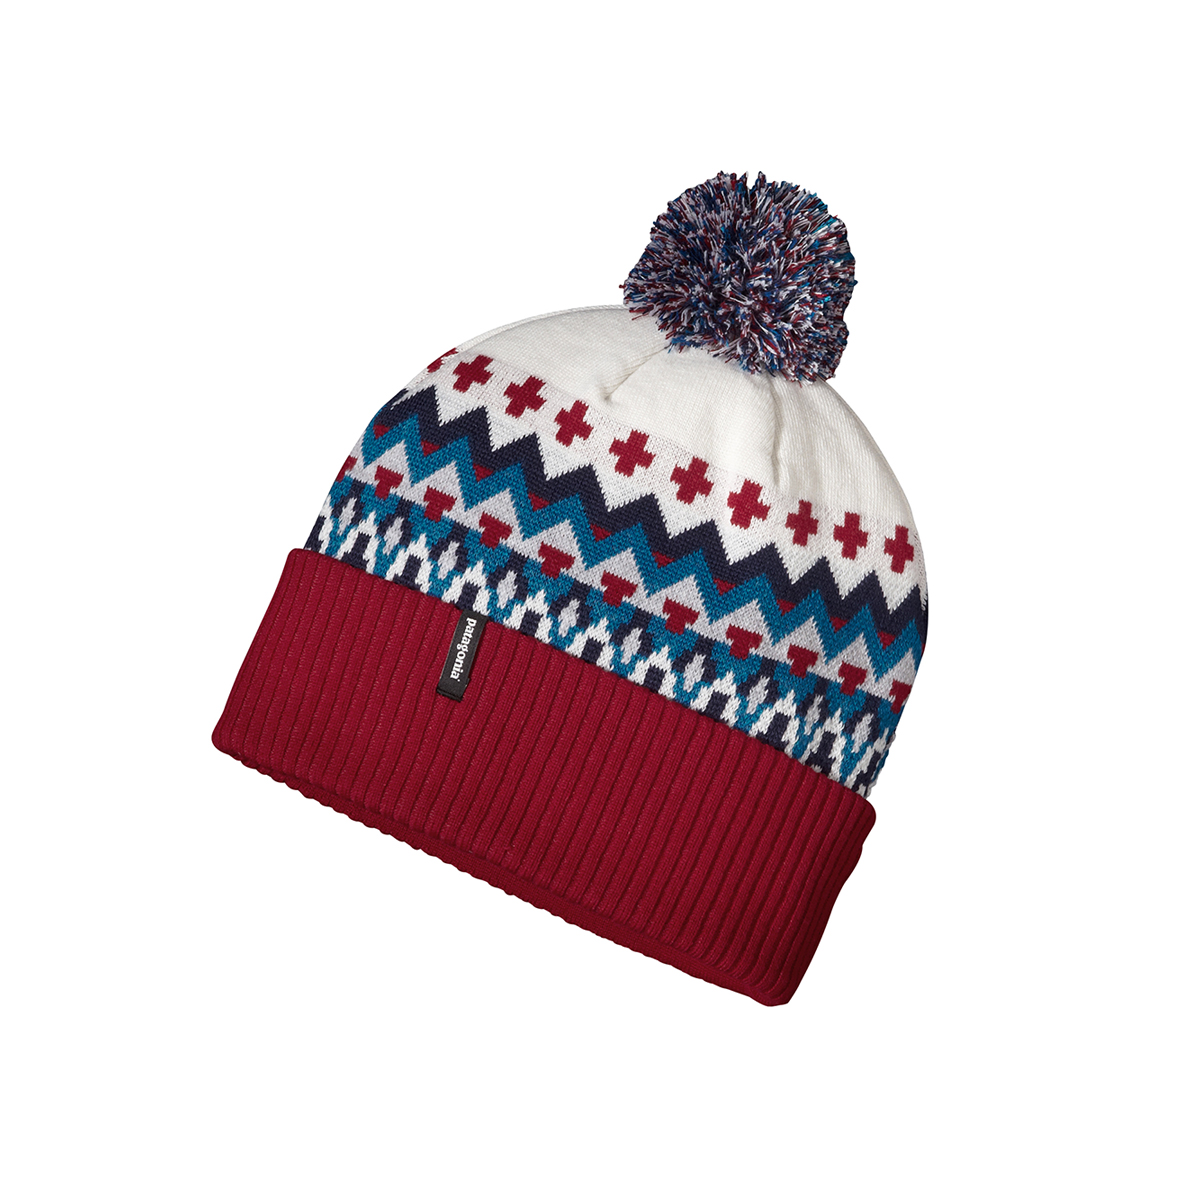 229511d5aa0a60 free shipping patagonia powder town beanie hats caps epictv shop efb6a 46e04